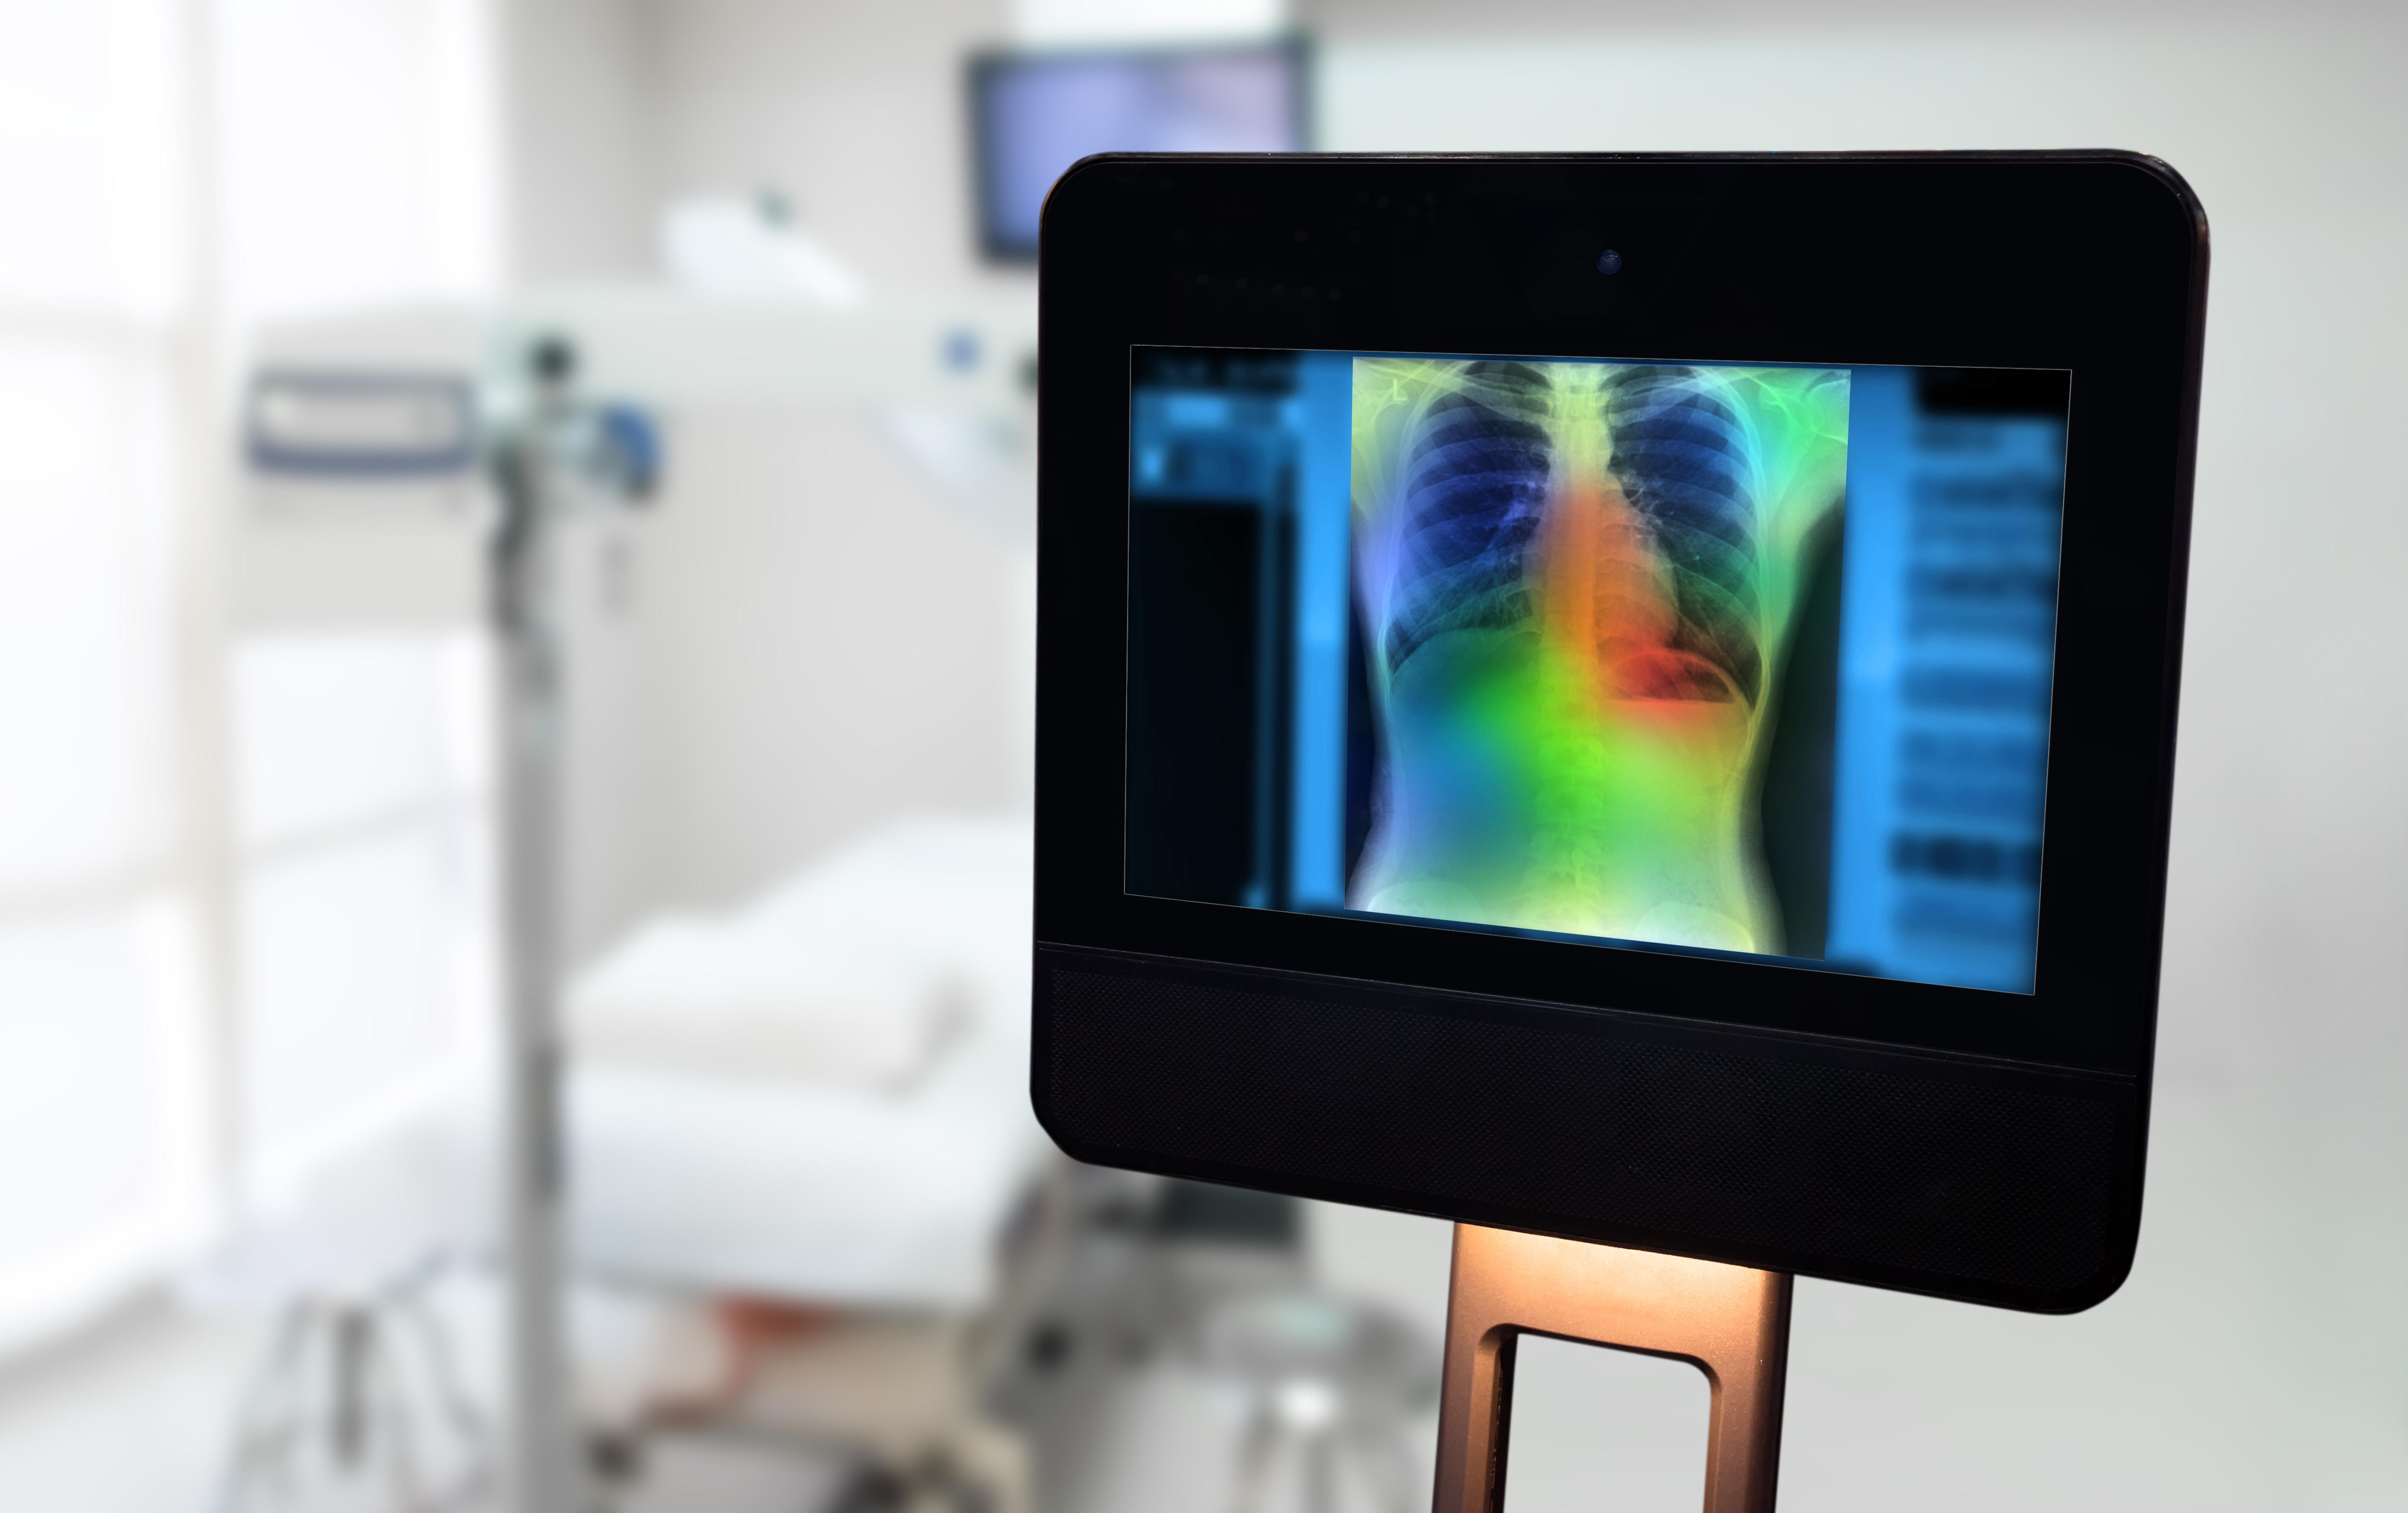 Is AI Ready to Help Diagnose COVID-19?